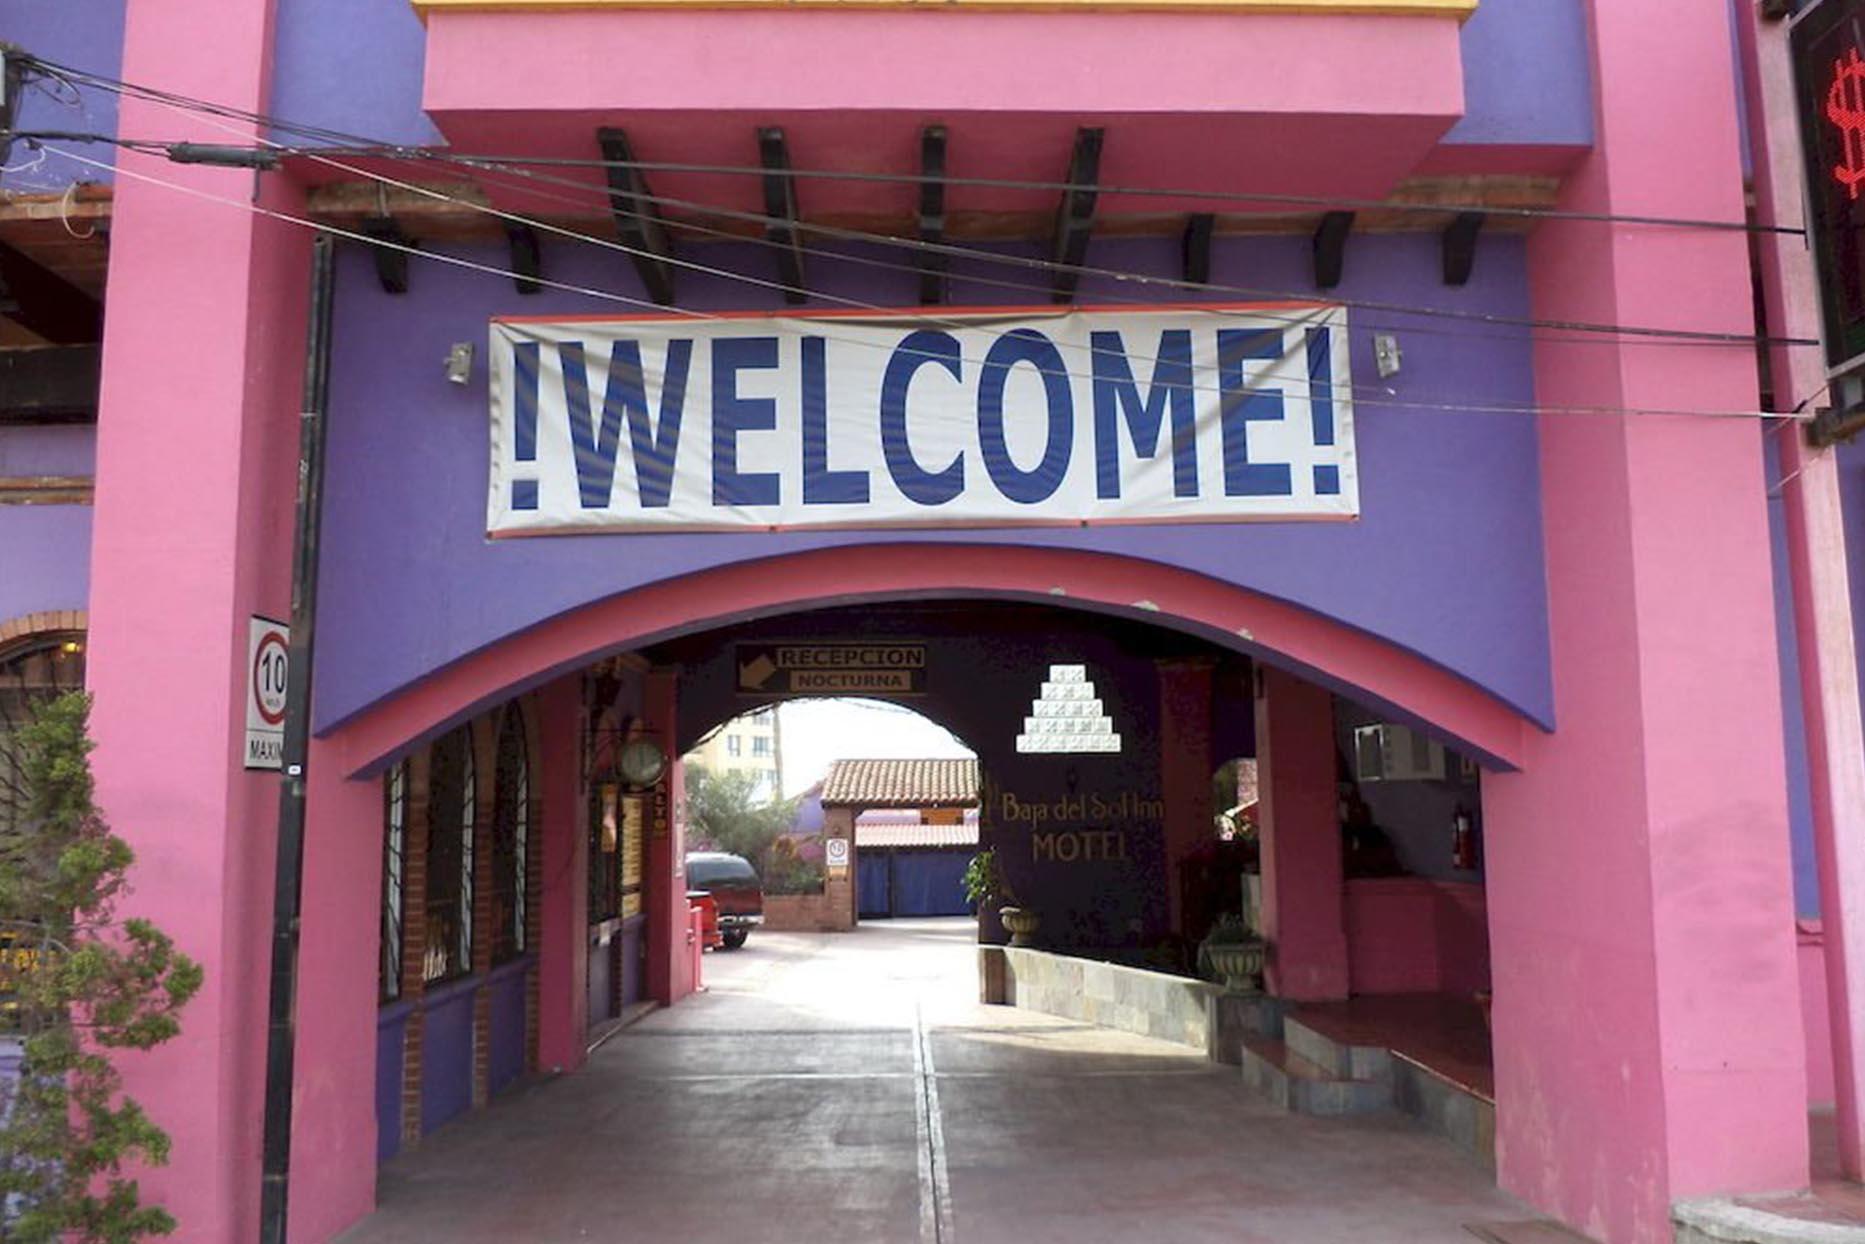 Motel Baja Del Sol Inn entrada